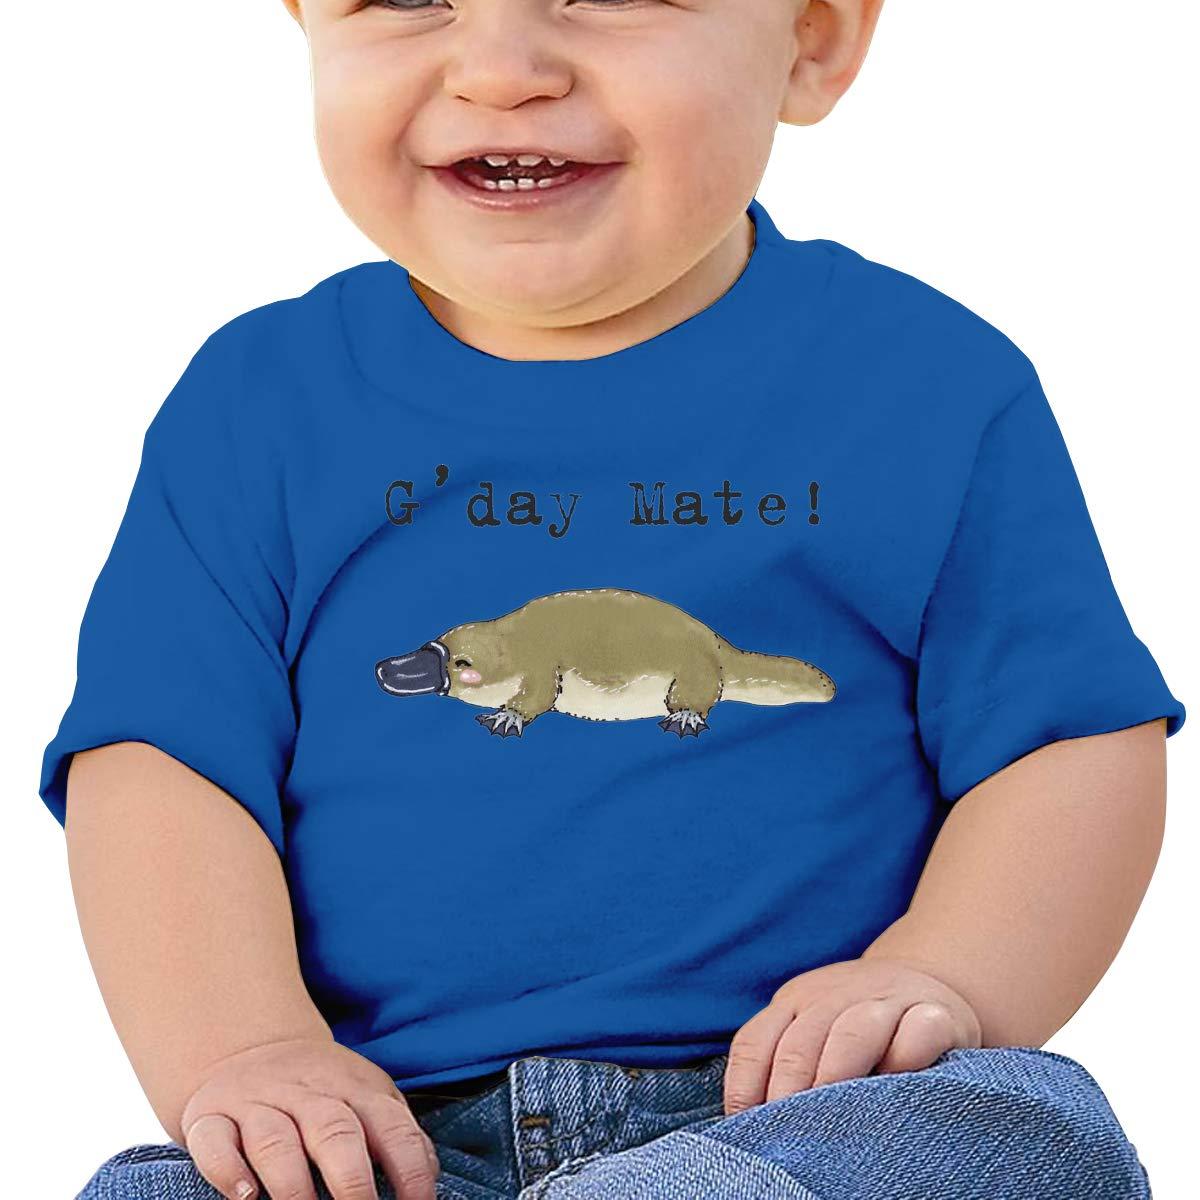 XHX403 Little Platypus Animals Series Infant Kids T Shirt Cotton Tee Toddler Baby 6-18M